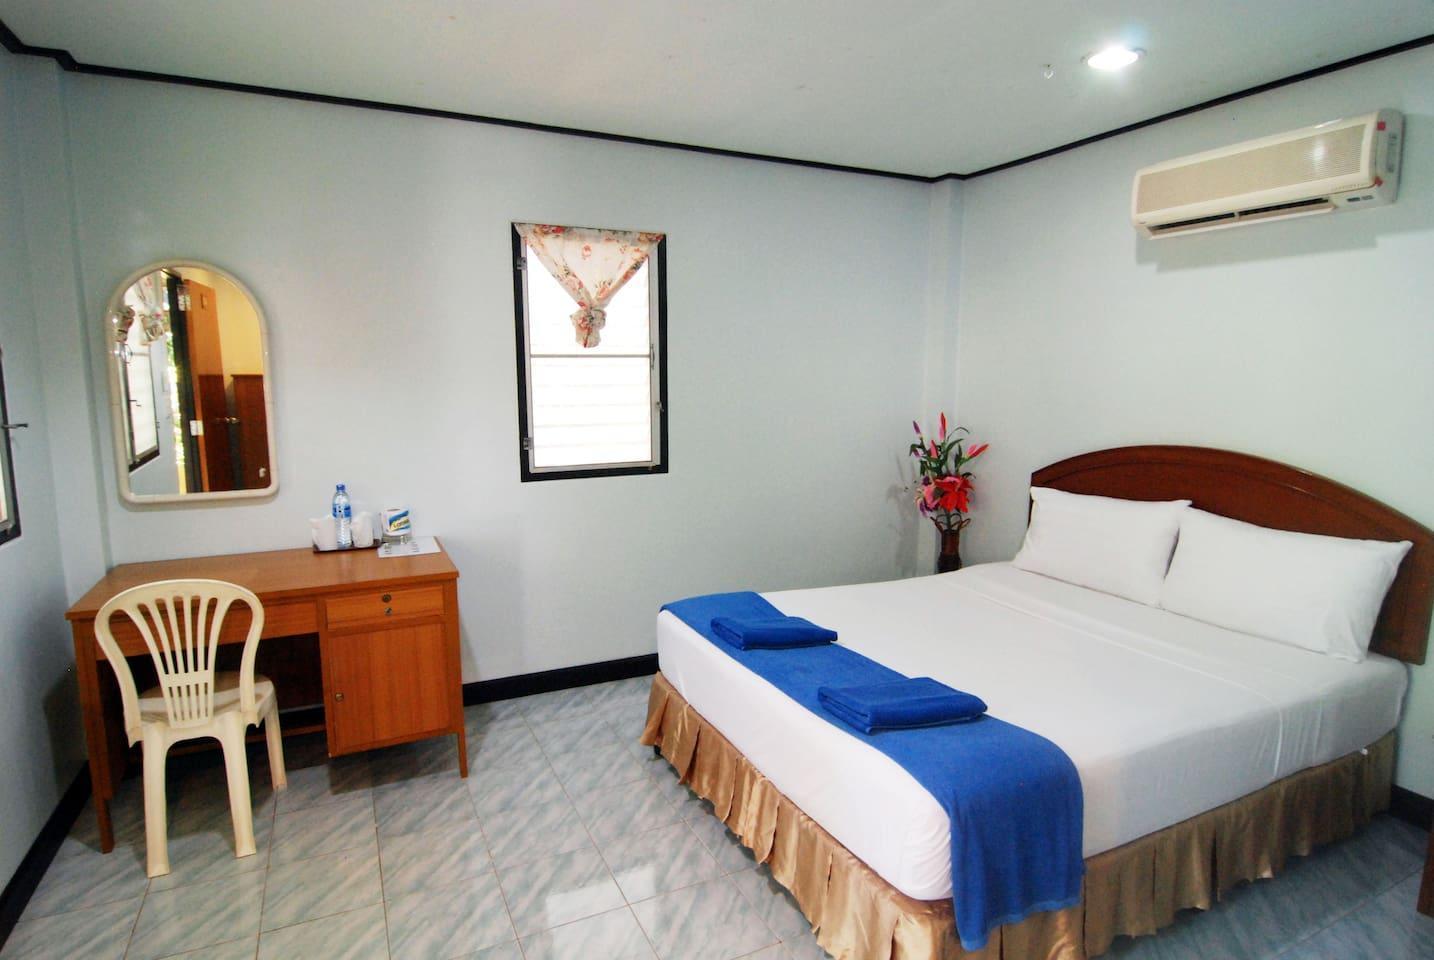 Lanta Coral Beach Resort อพาร์ตเมนต์ 1 ห้องนอน 1 ห้องน้ำส่วนตัว ขนาด 15 ตร.ม. – เกาะลันตาน้อย